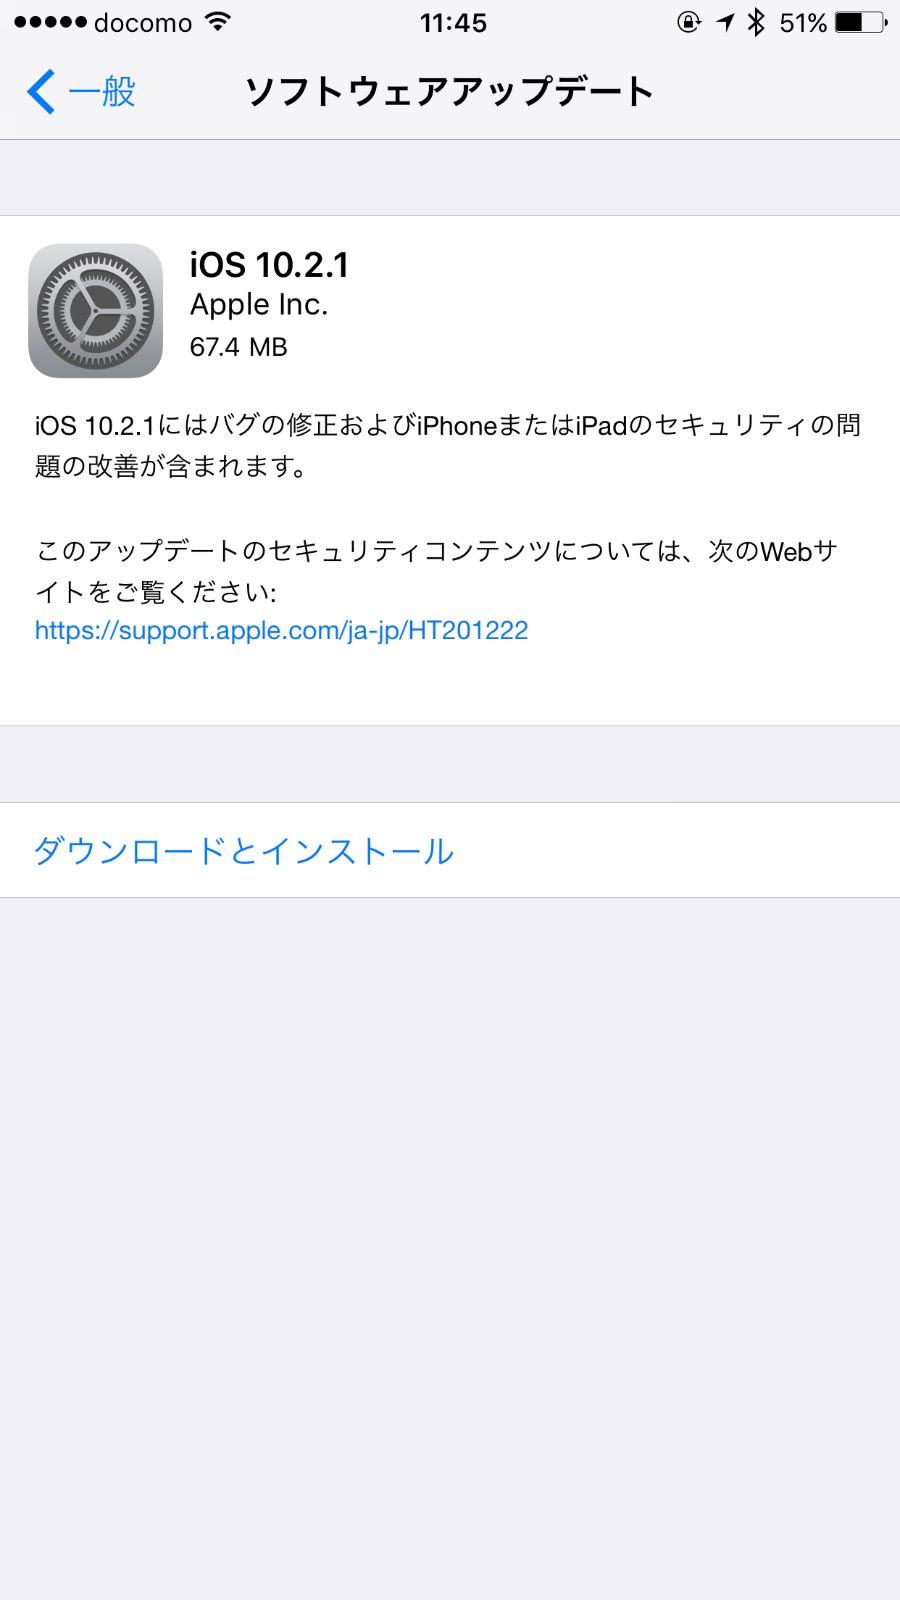 【iOS 10】「iOS 10.2.1」リリース 〜バグの修正及びセキュリティアップデート